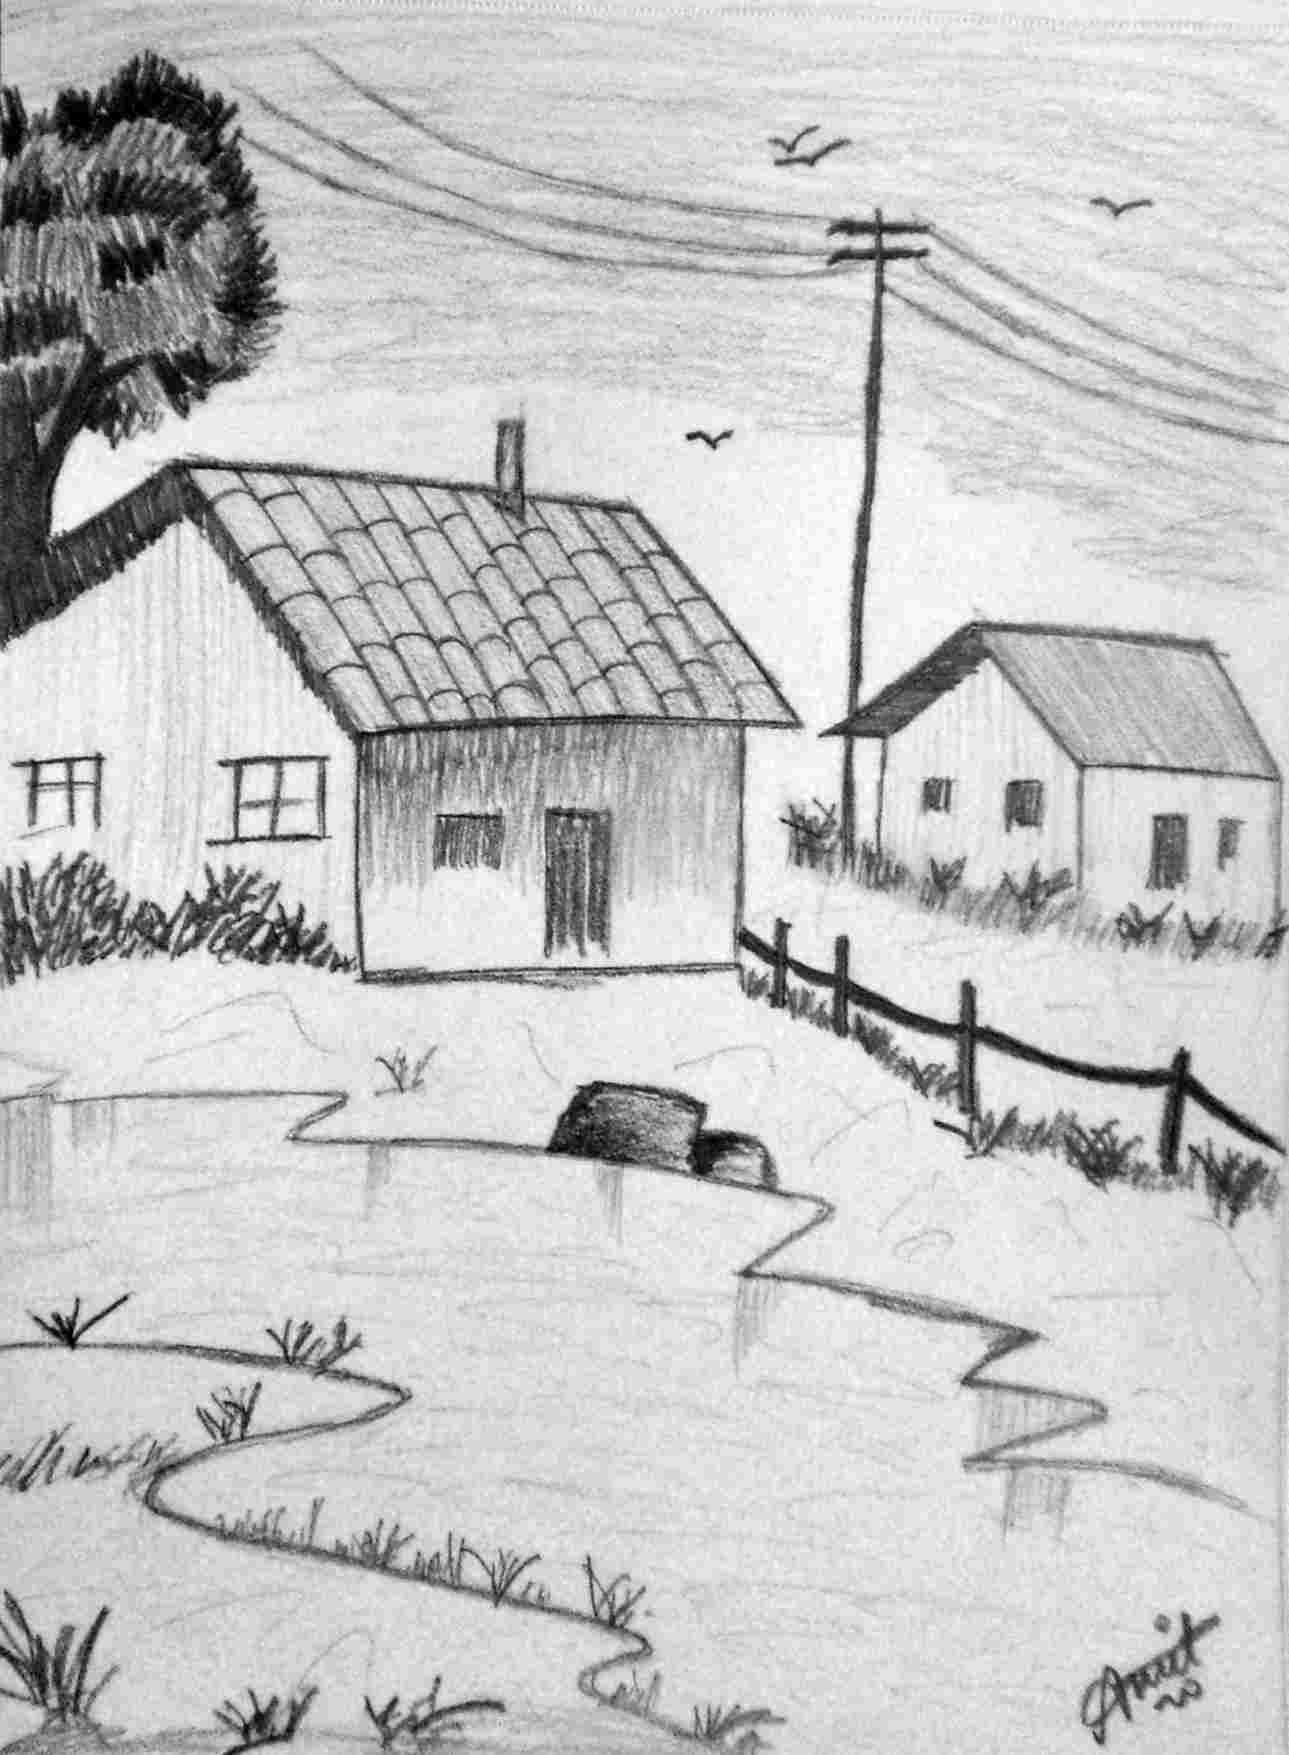 House Pencil Sketch : house, pencil, sketch, Old-Barns-pencil-sketch-old-house, Landscape, Drawing, Easy,, Pencil, Drawings,, Drawings, Beginners